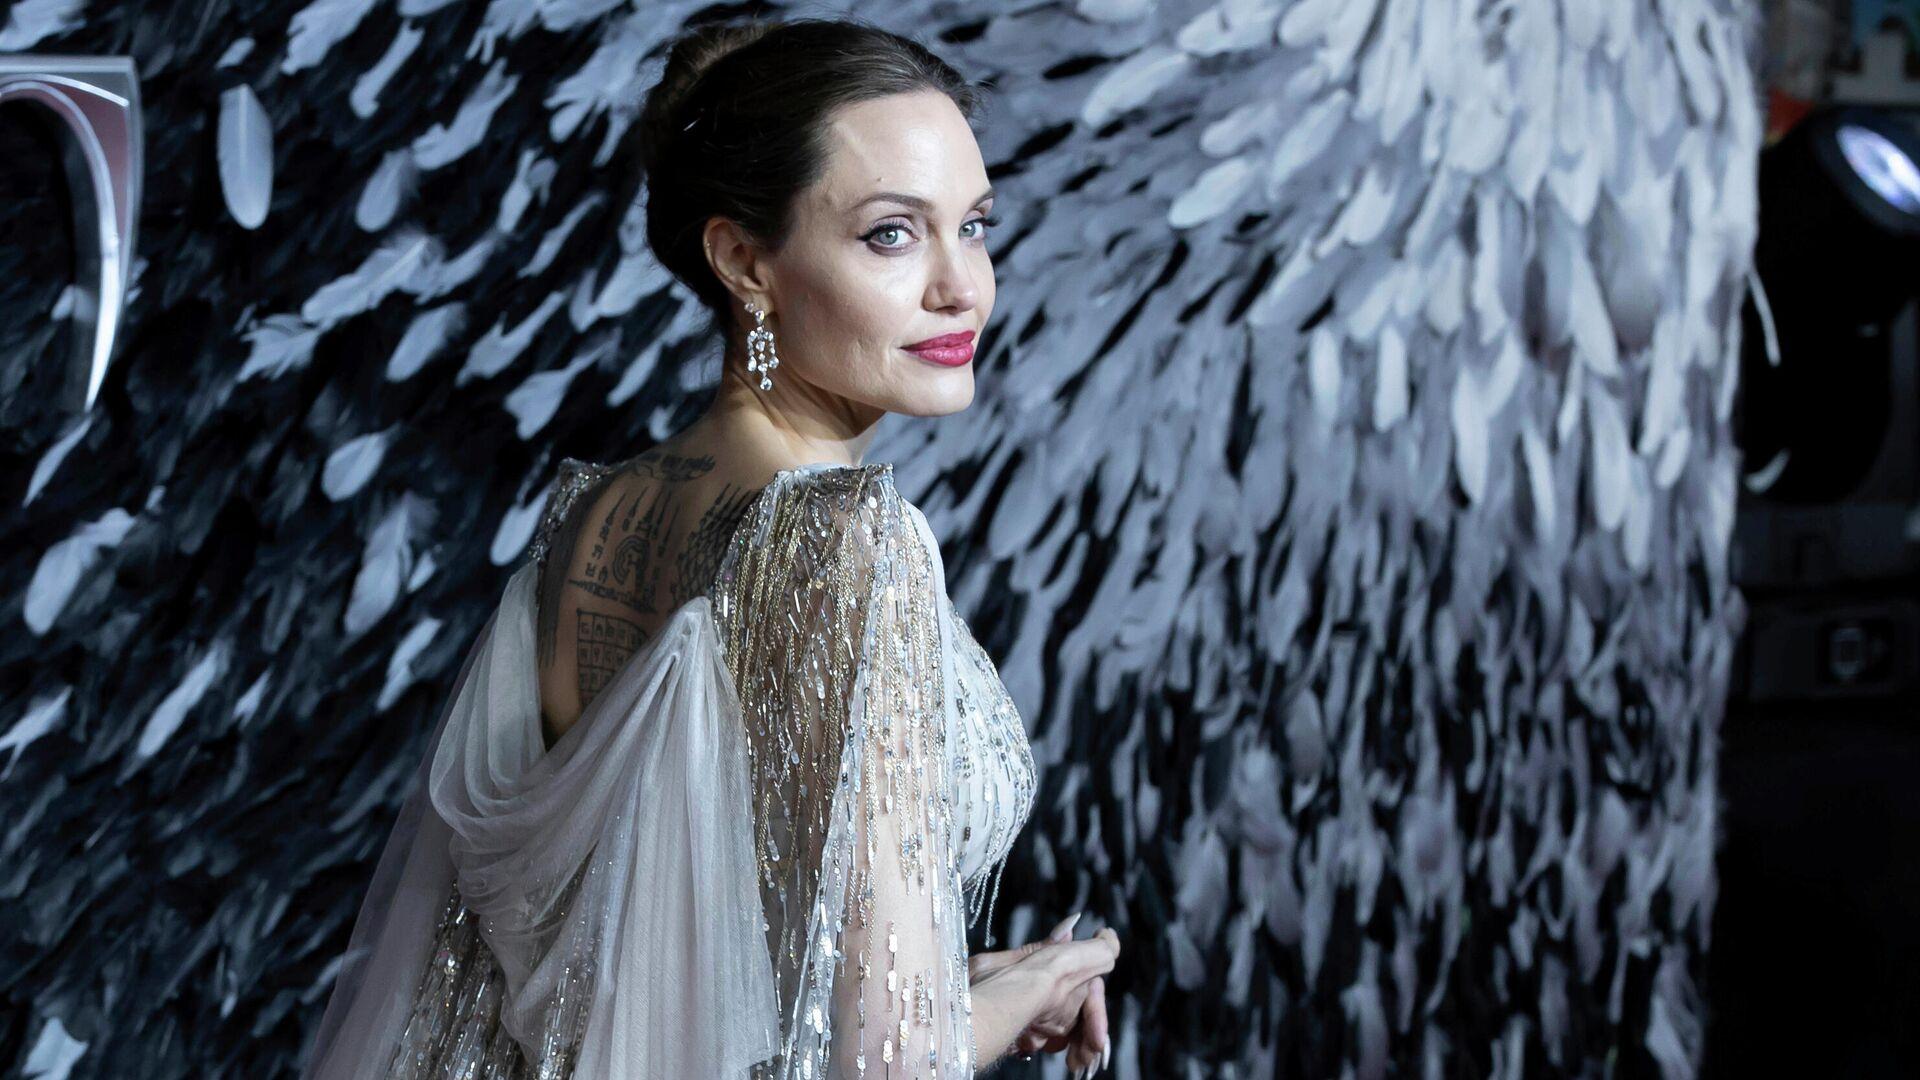 Анджелина Джоли   - Sputnik Грузия, 1920, 28.09.2021